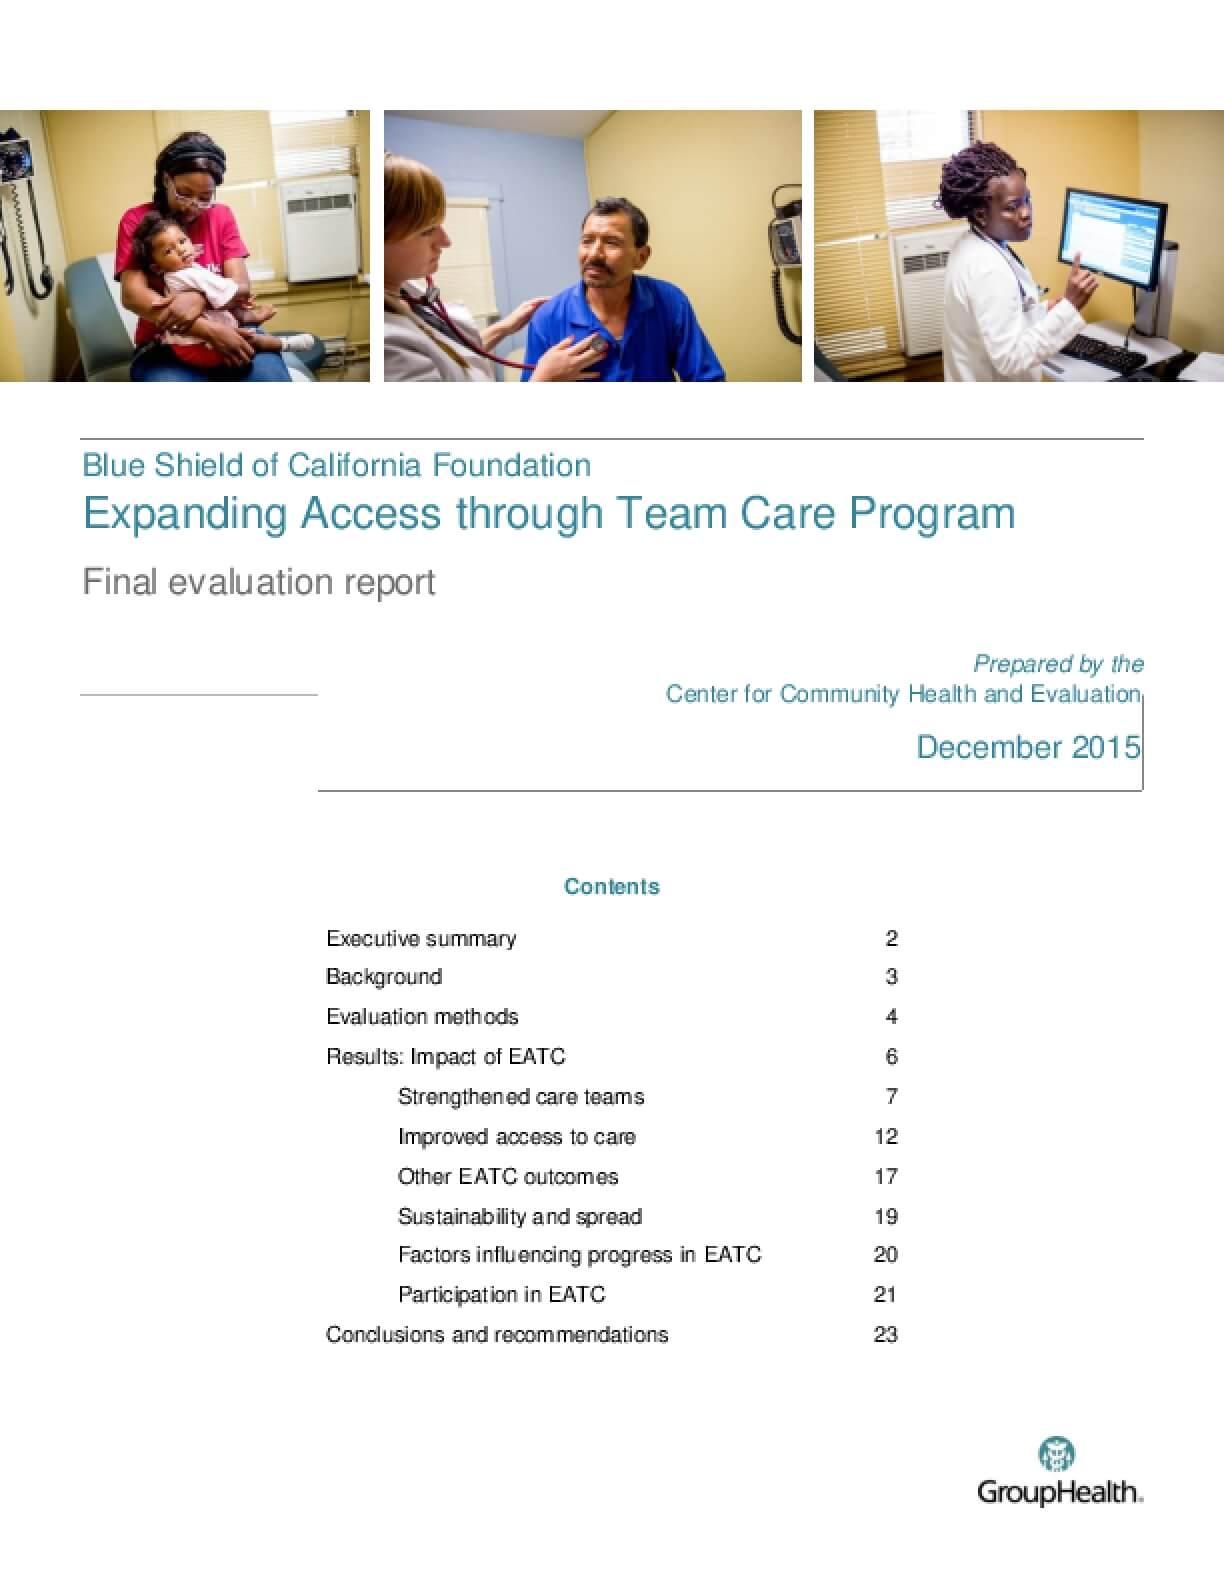 Expanding Access through Team Care: Program Final Evaluation Report